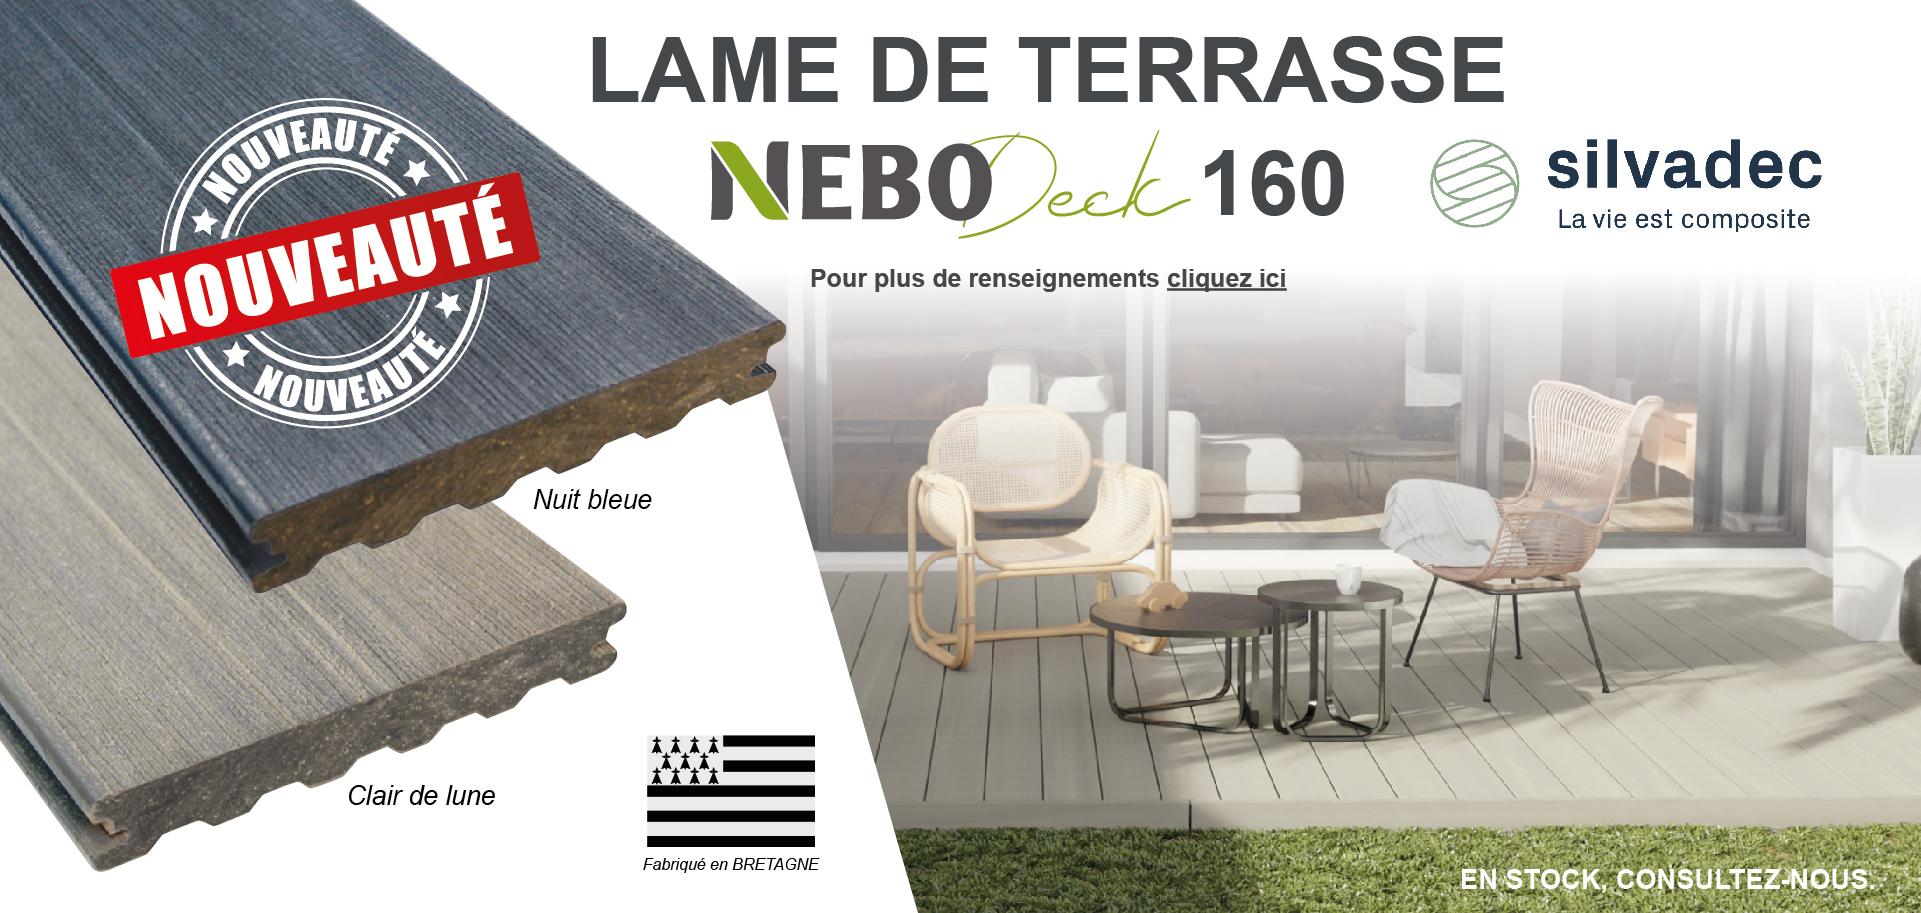 Lame de terrasse NeboDeck 160